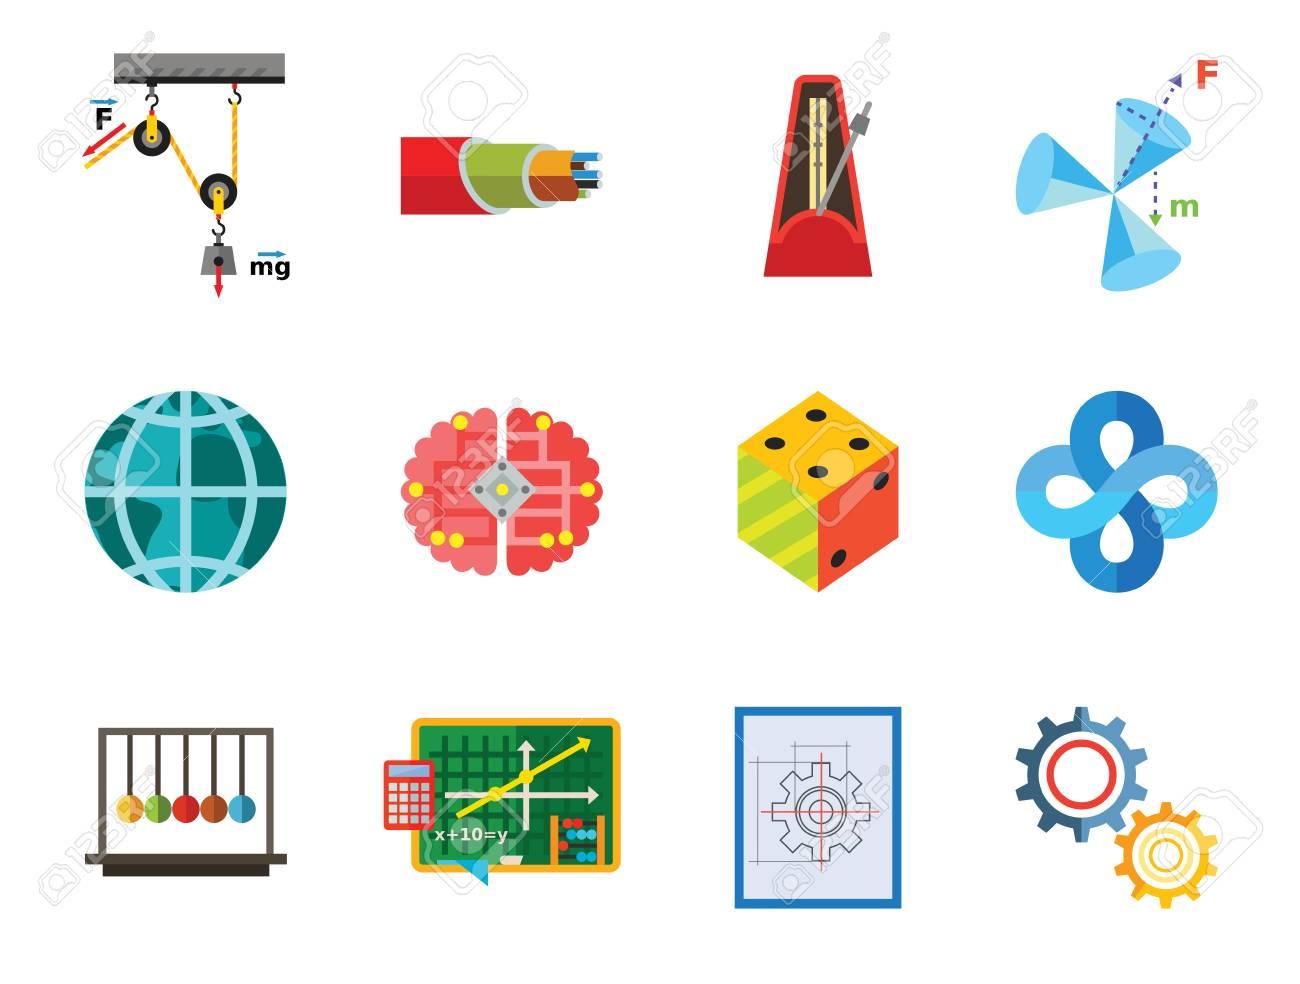 Education Icon Set Gear Wheel Drawing Metronome With Pendulum Logic Diagram Images Collision Balls Globe Cubes Philosophy